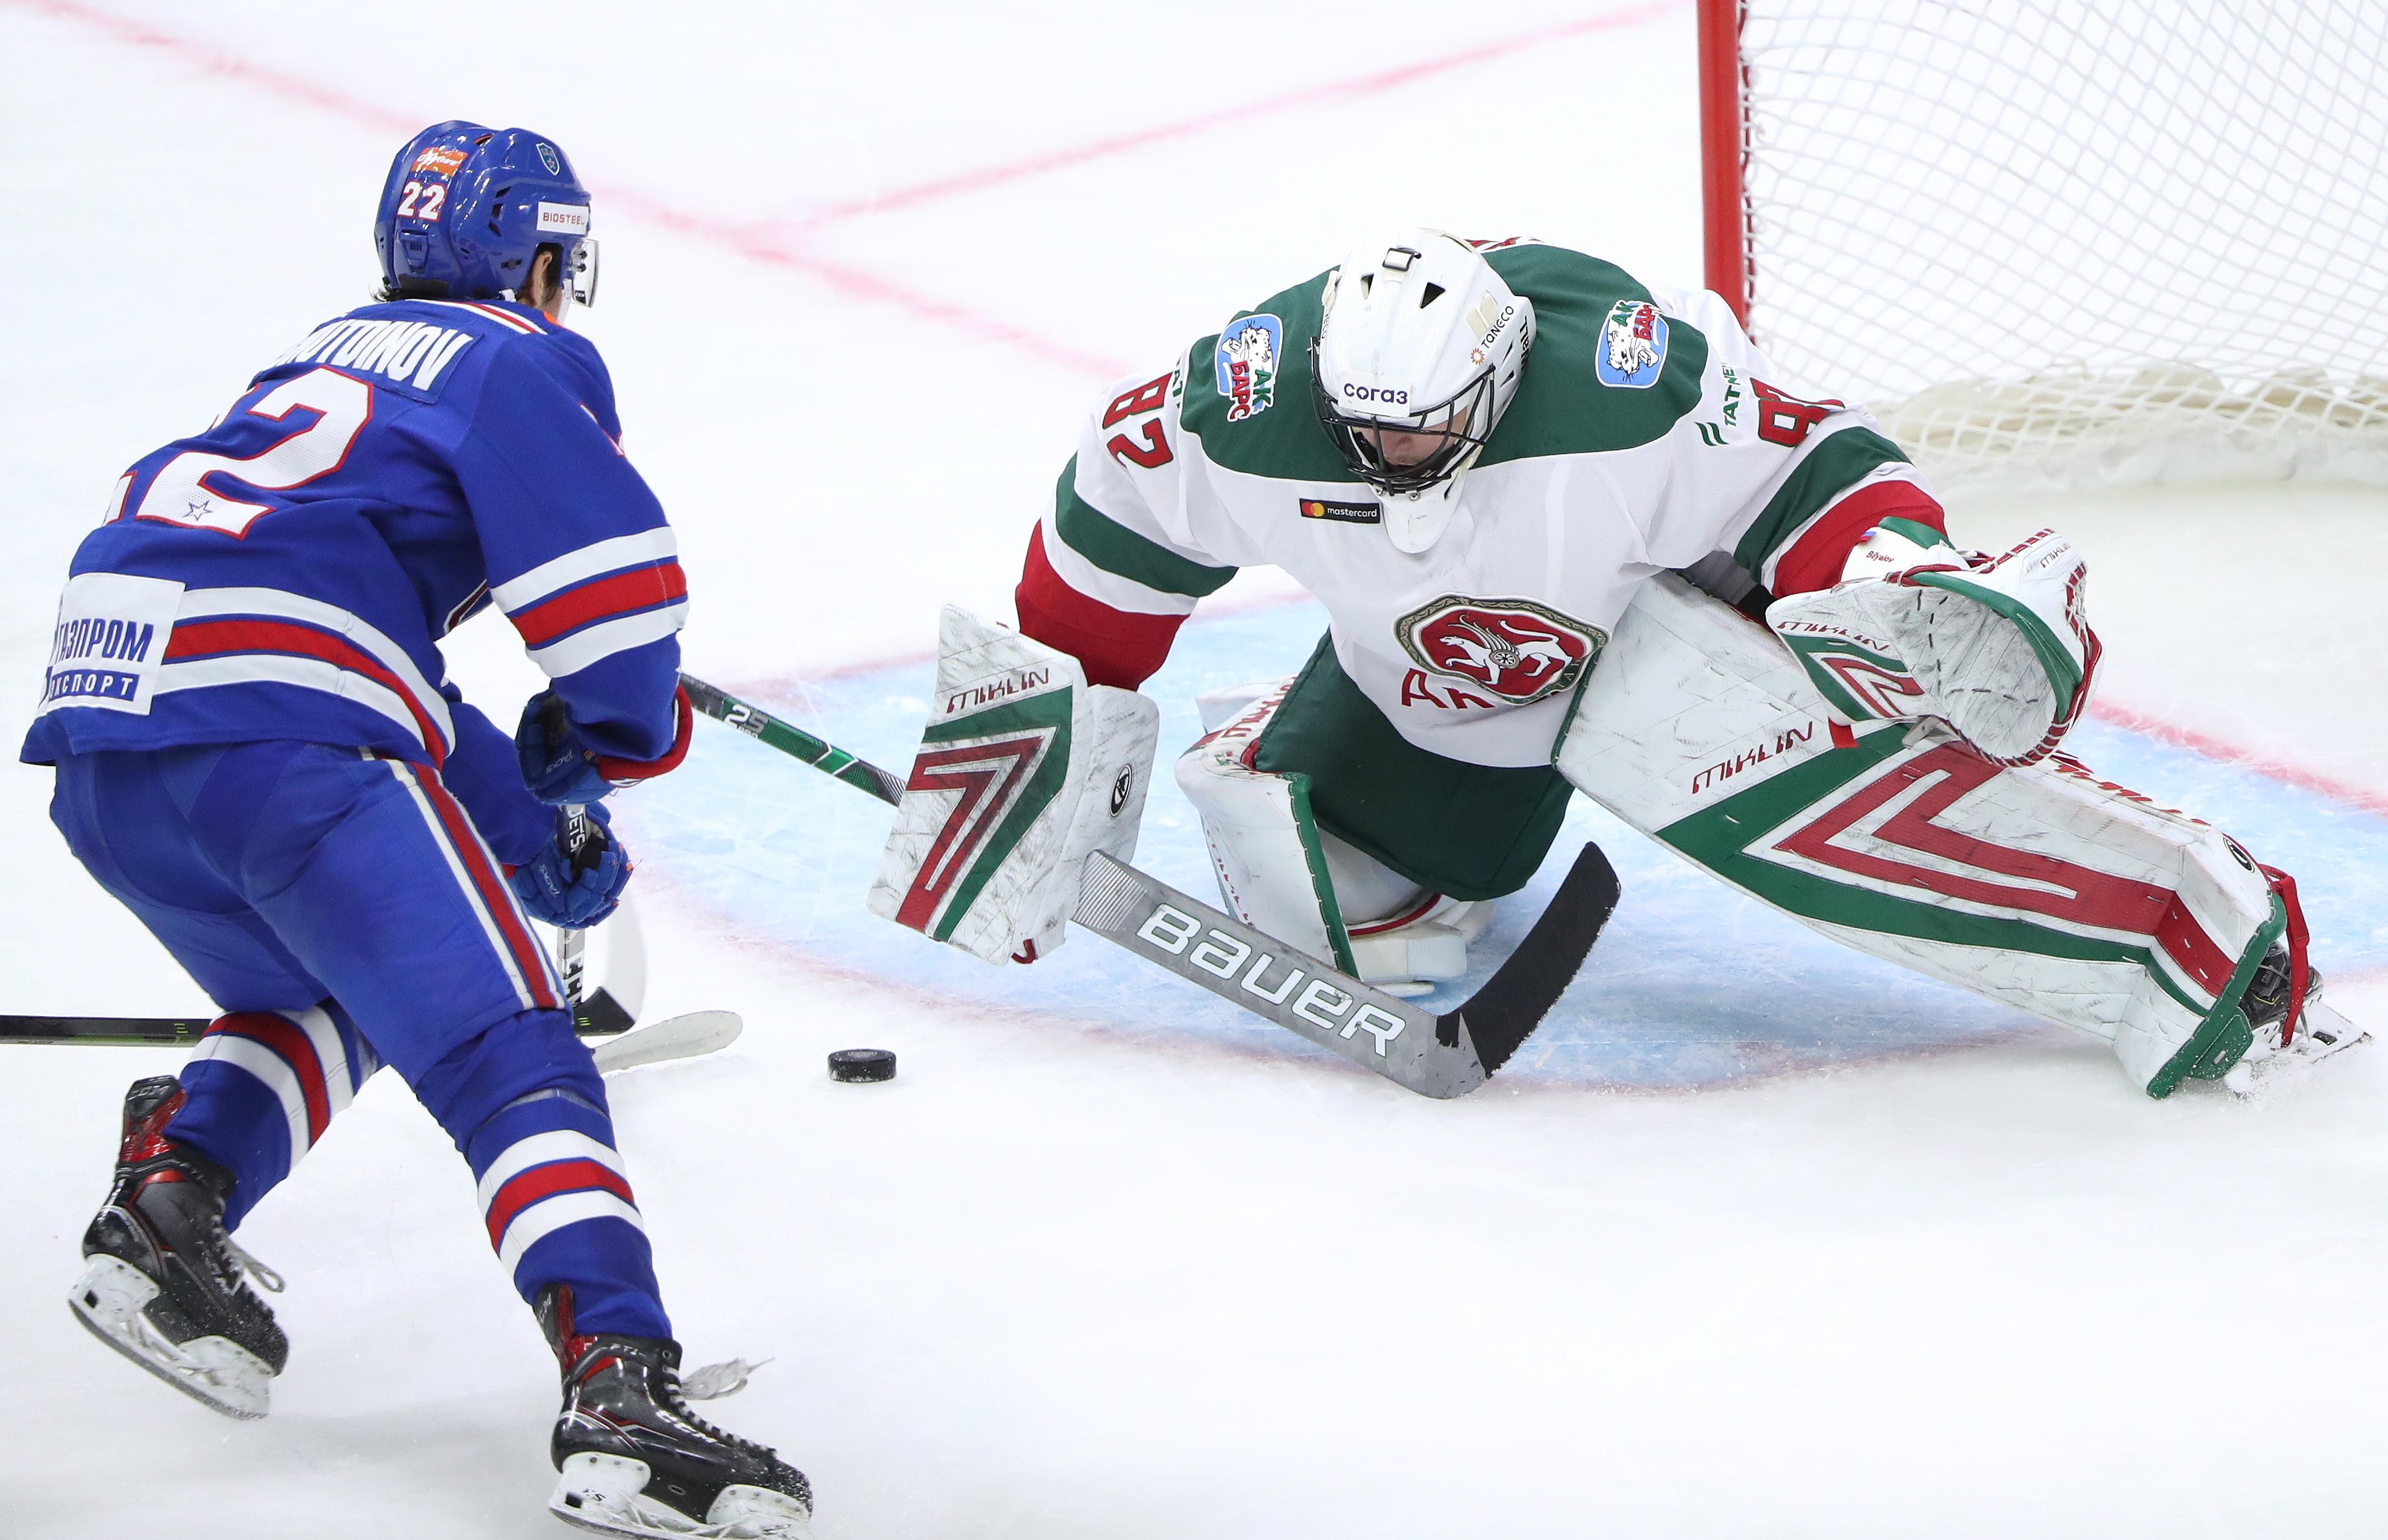 2020/2021 Kontinental Hockey League: SKA St Petersburg vs Ak Bars Kazan